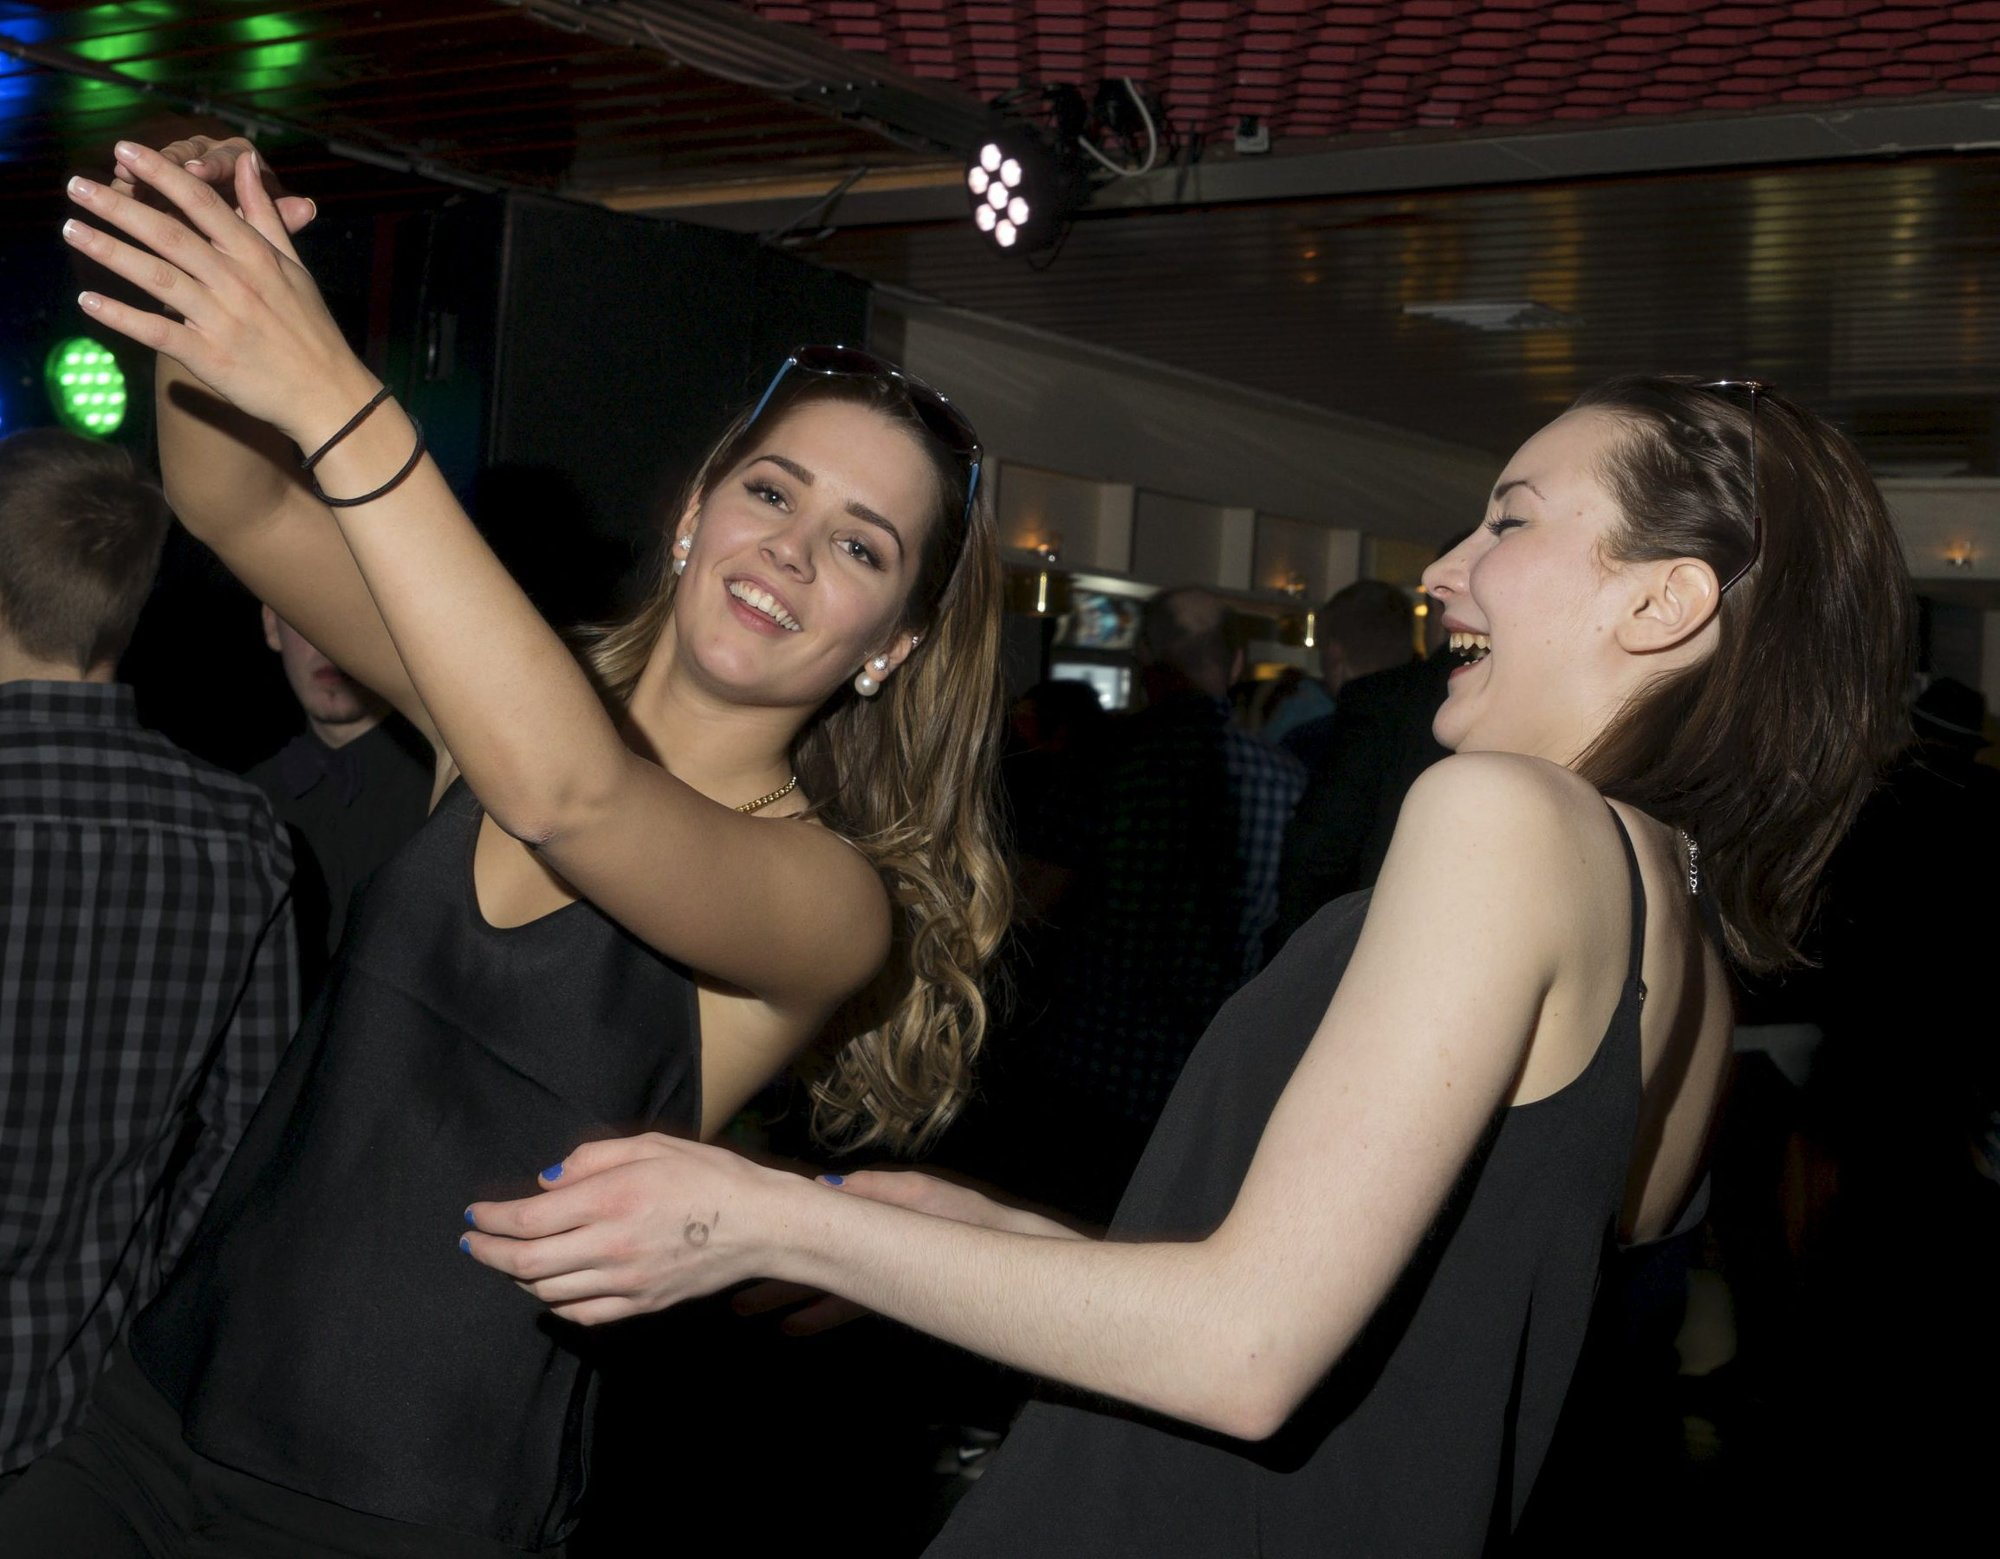 Women dating sms date thai escort dating porno norske vardø